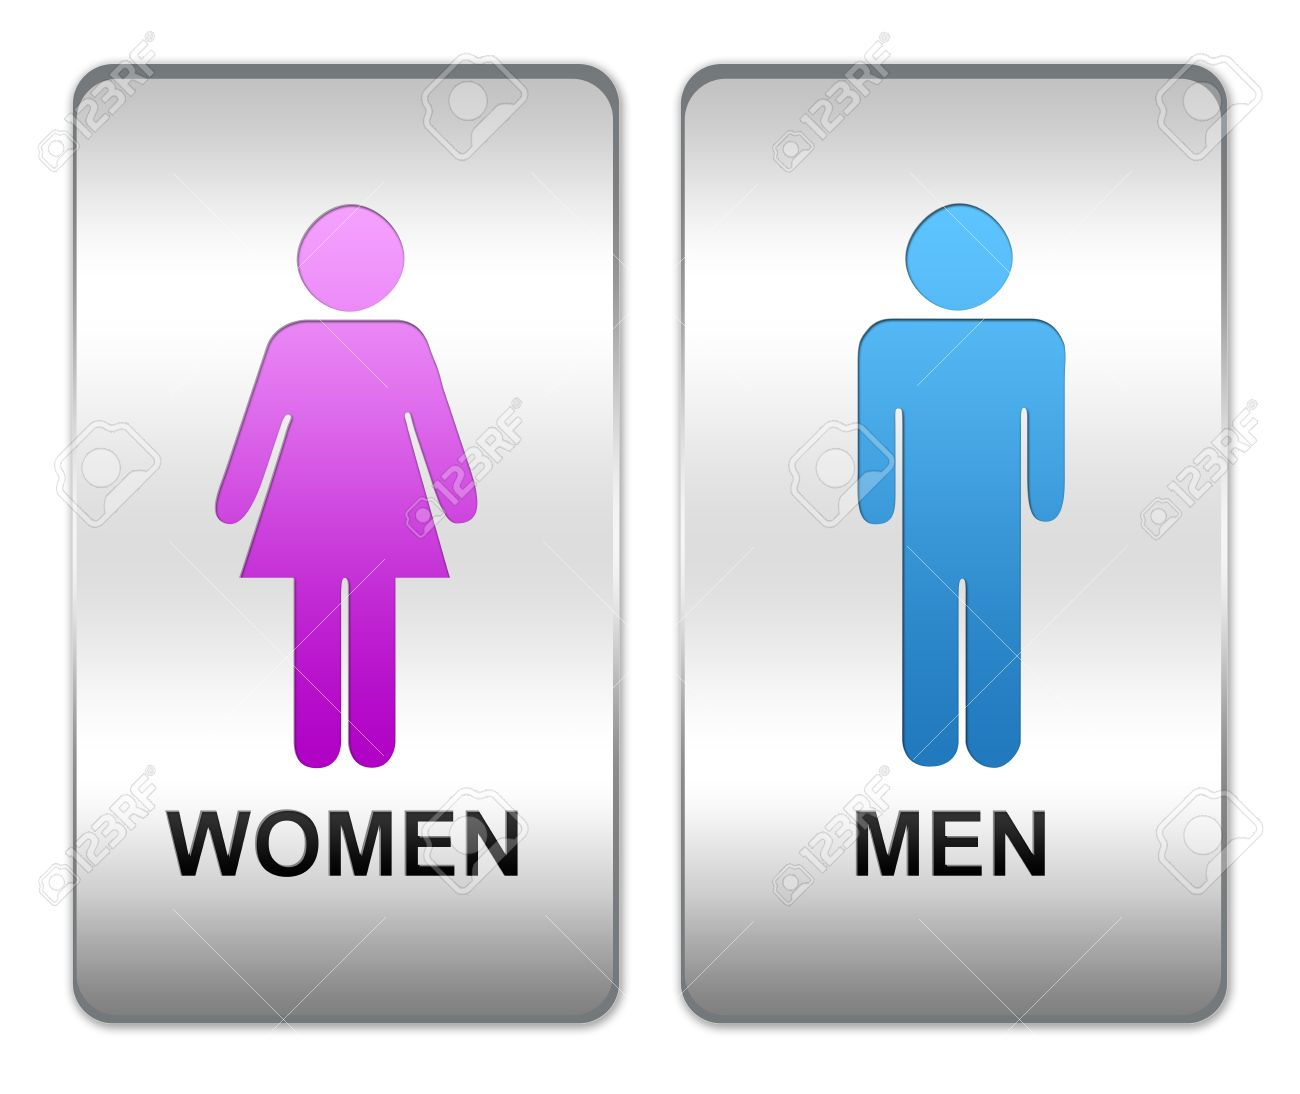 Bathroom Signs Silver men and women bathroom sign | home design ideas